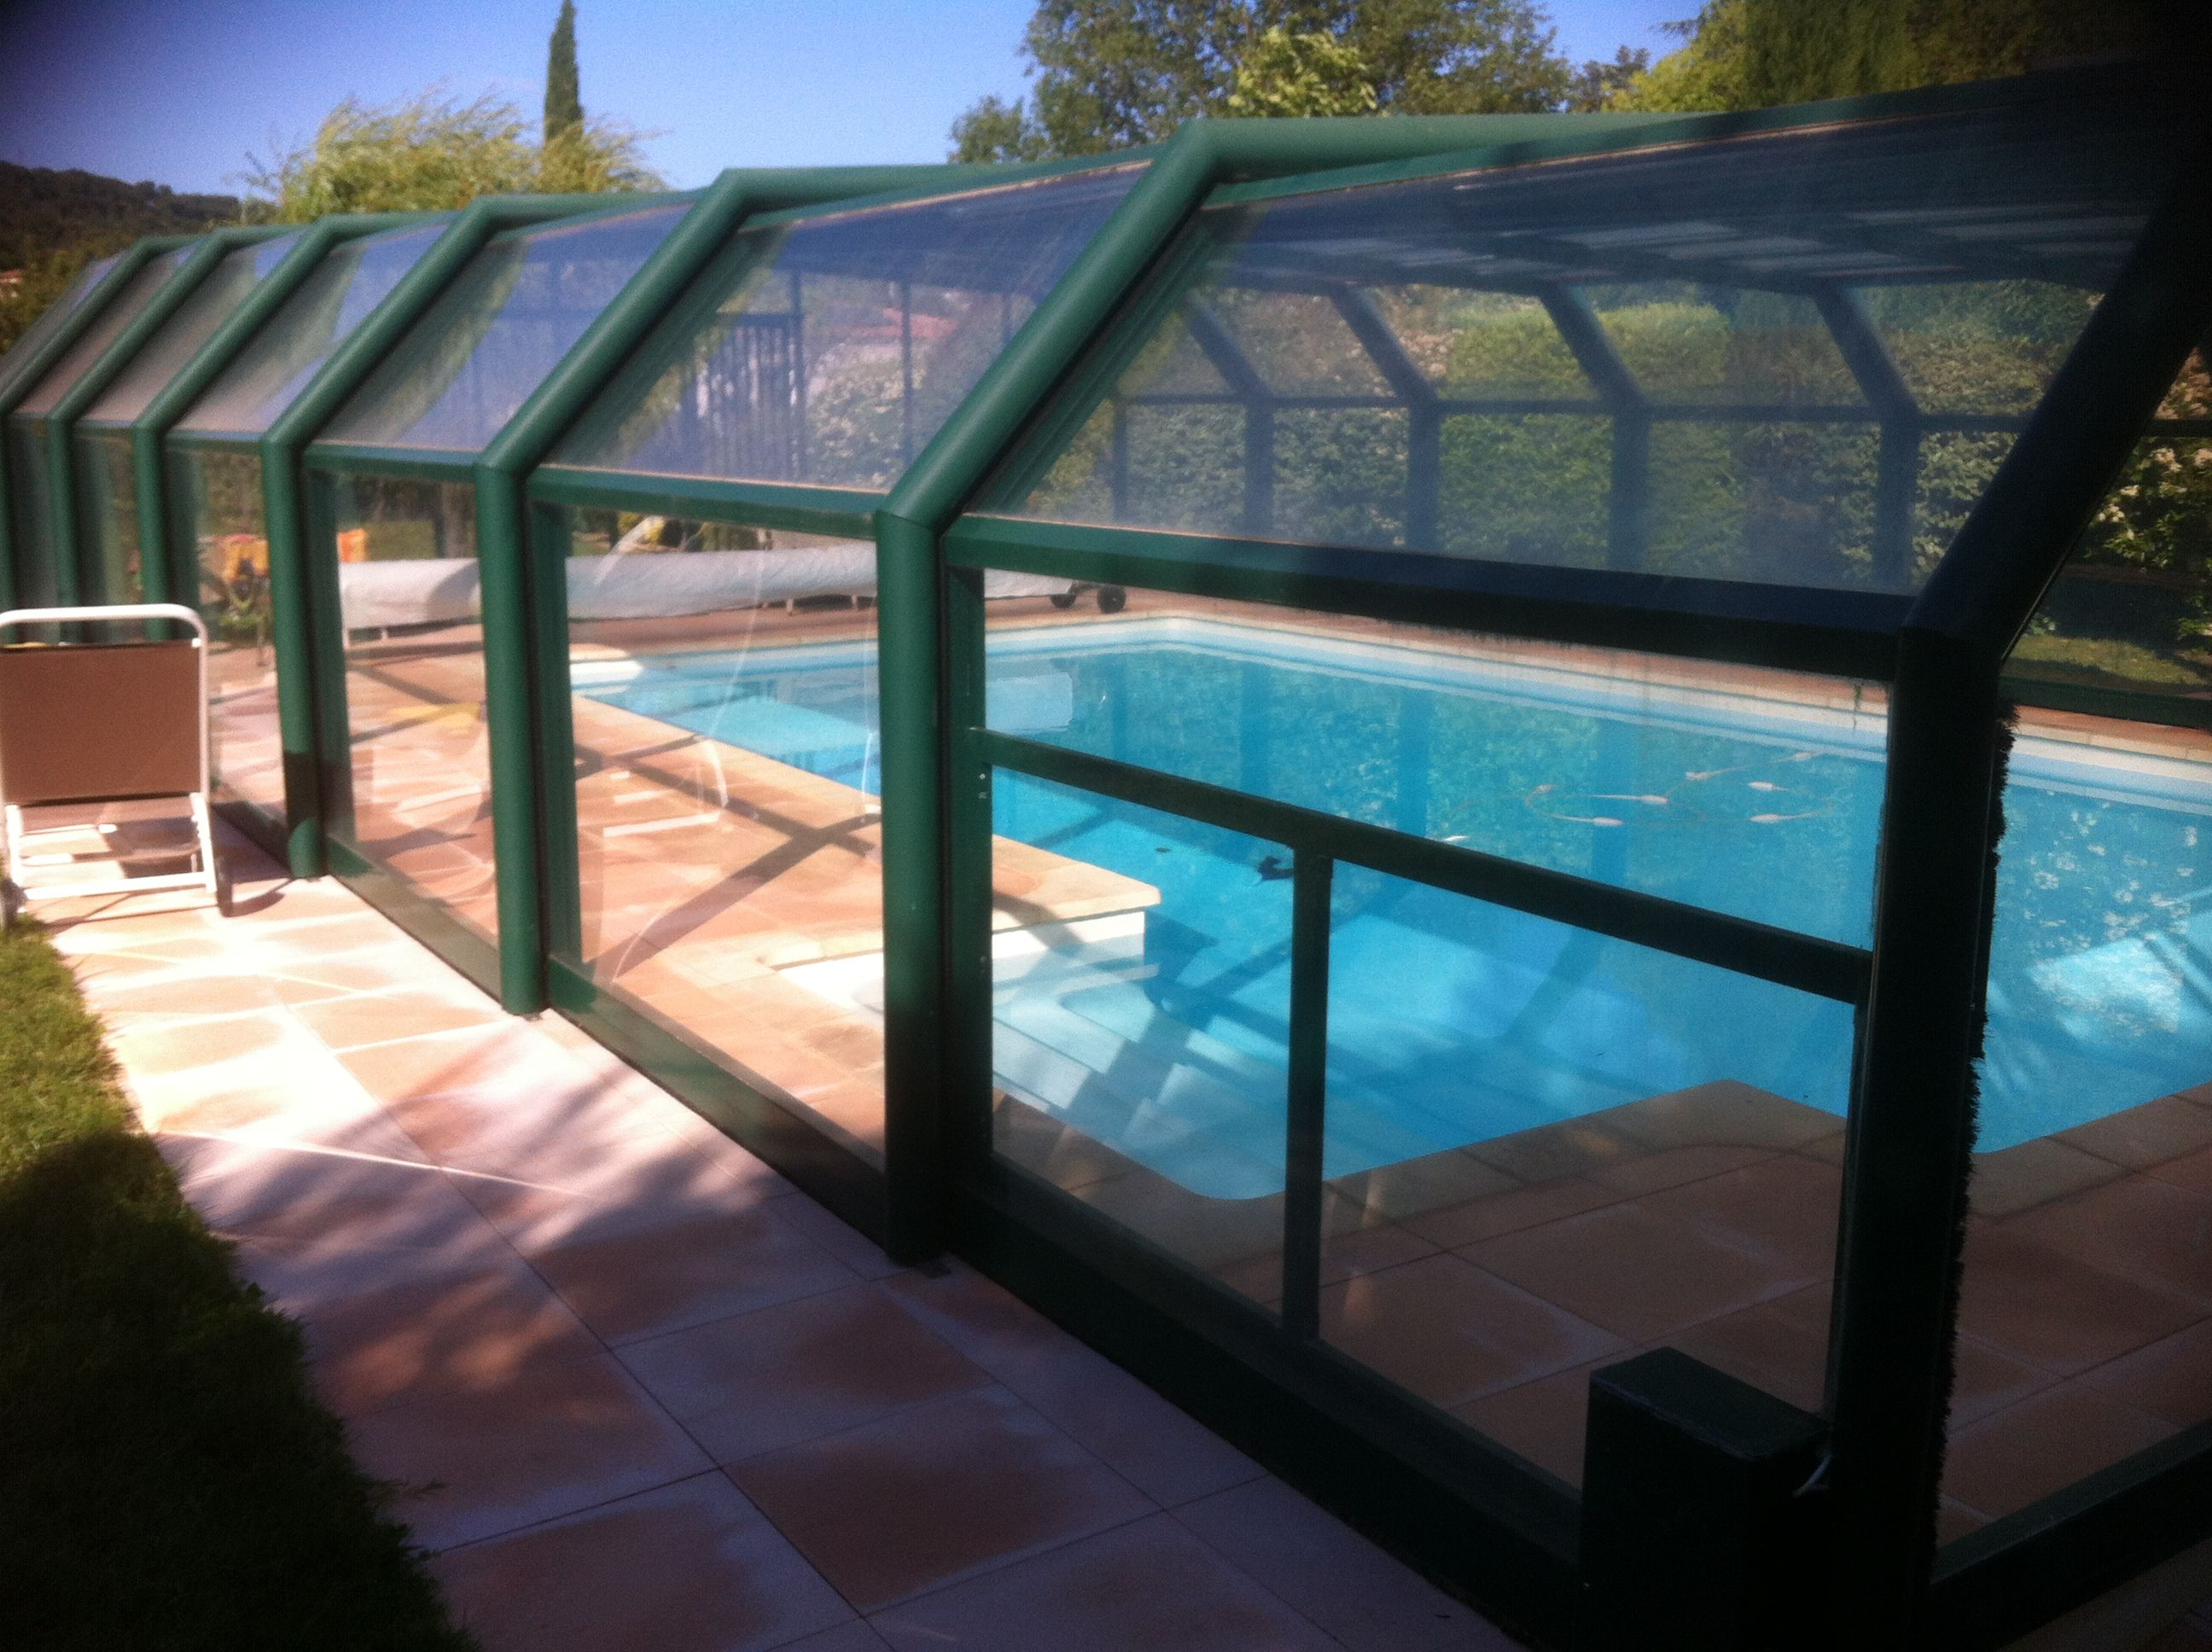 Entretien abri de piscines poseidon for Piscine entretien